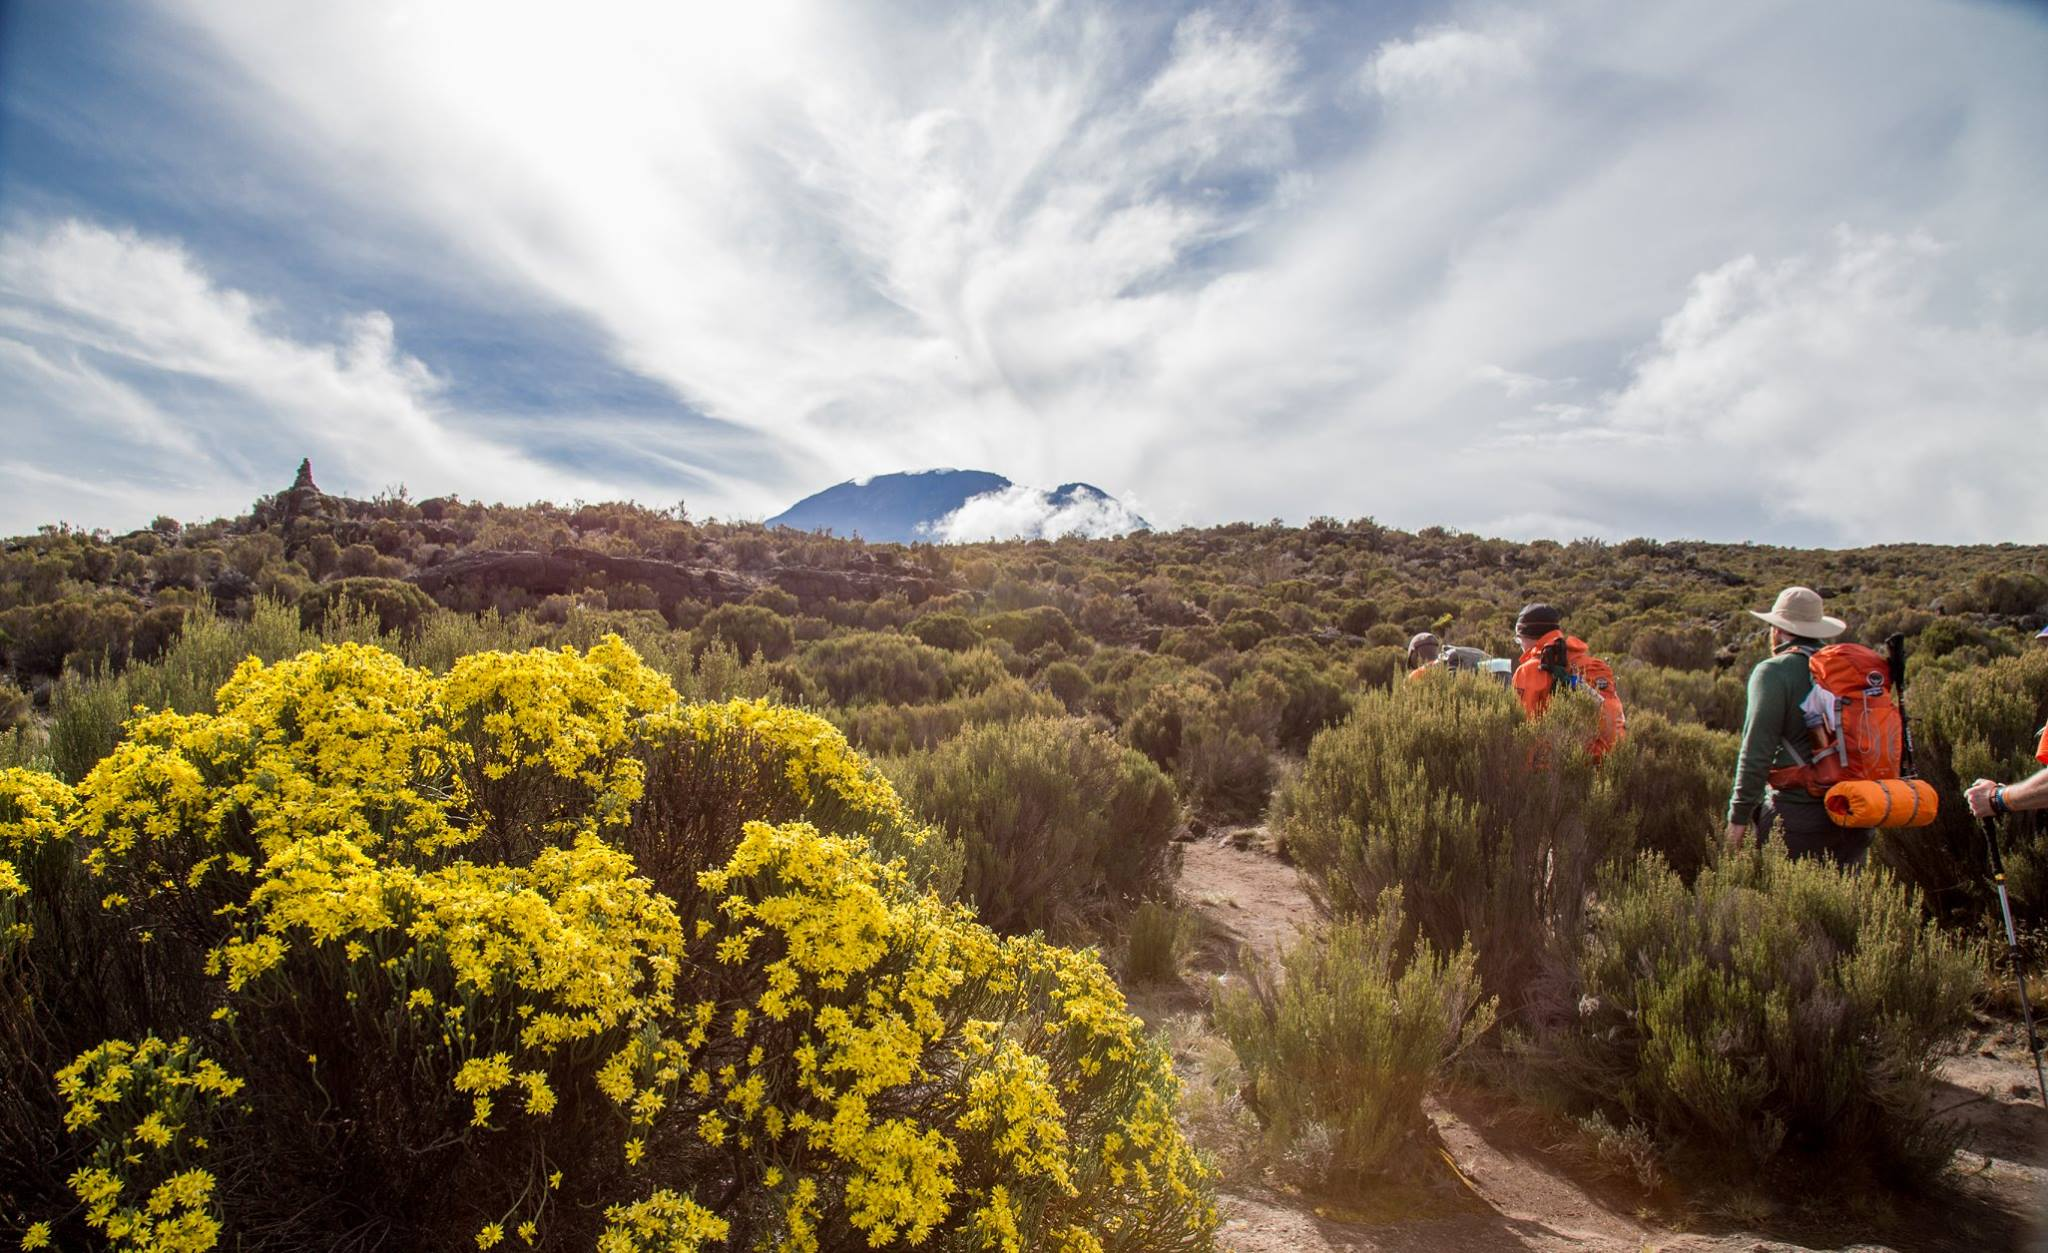 Distant Kilimanjaro